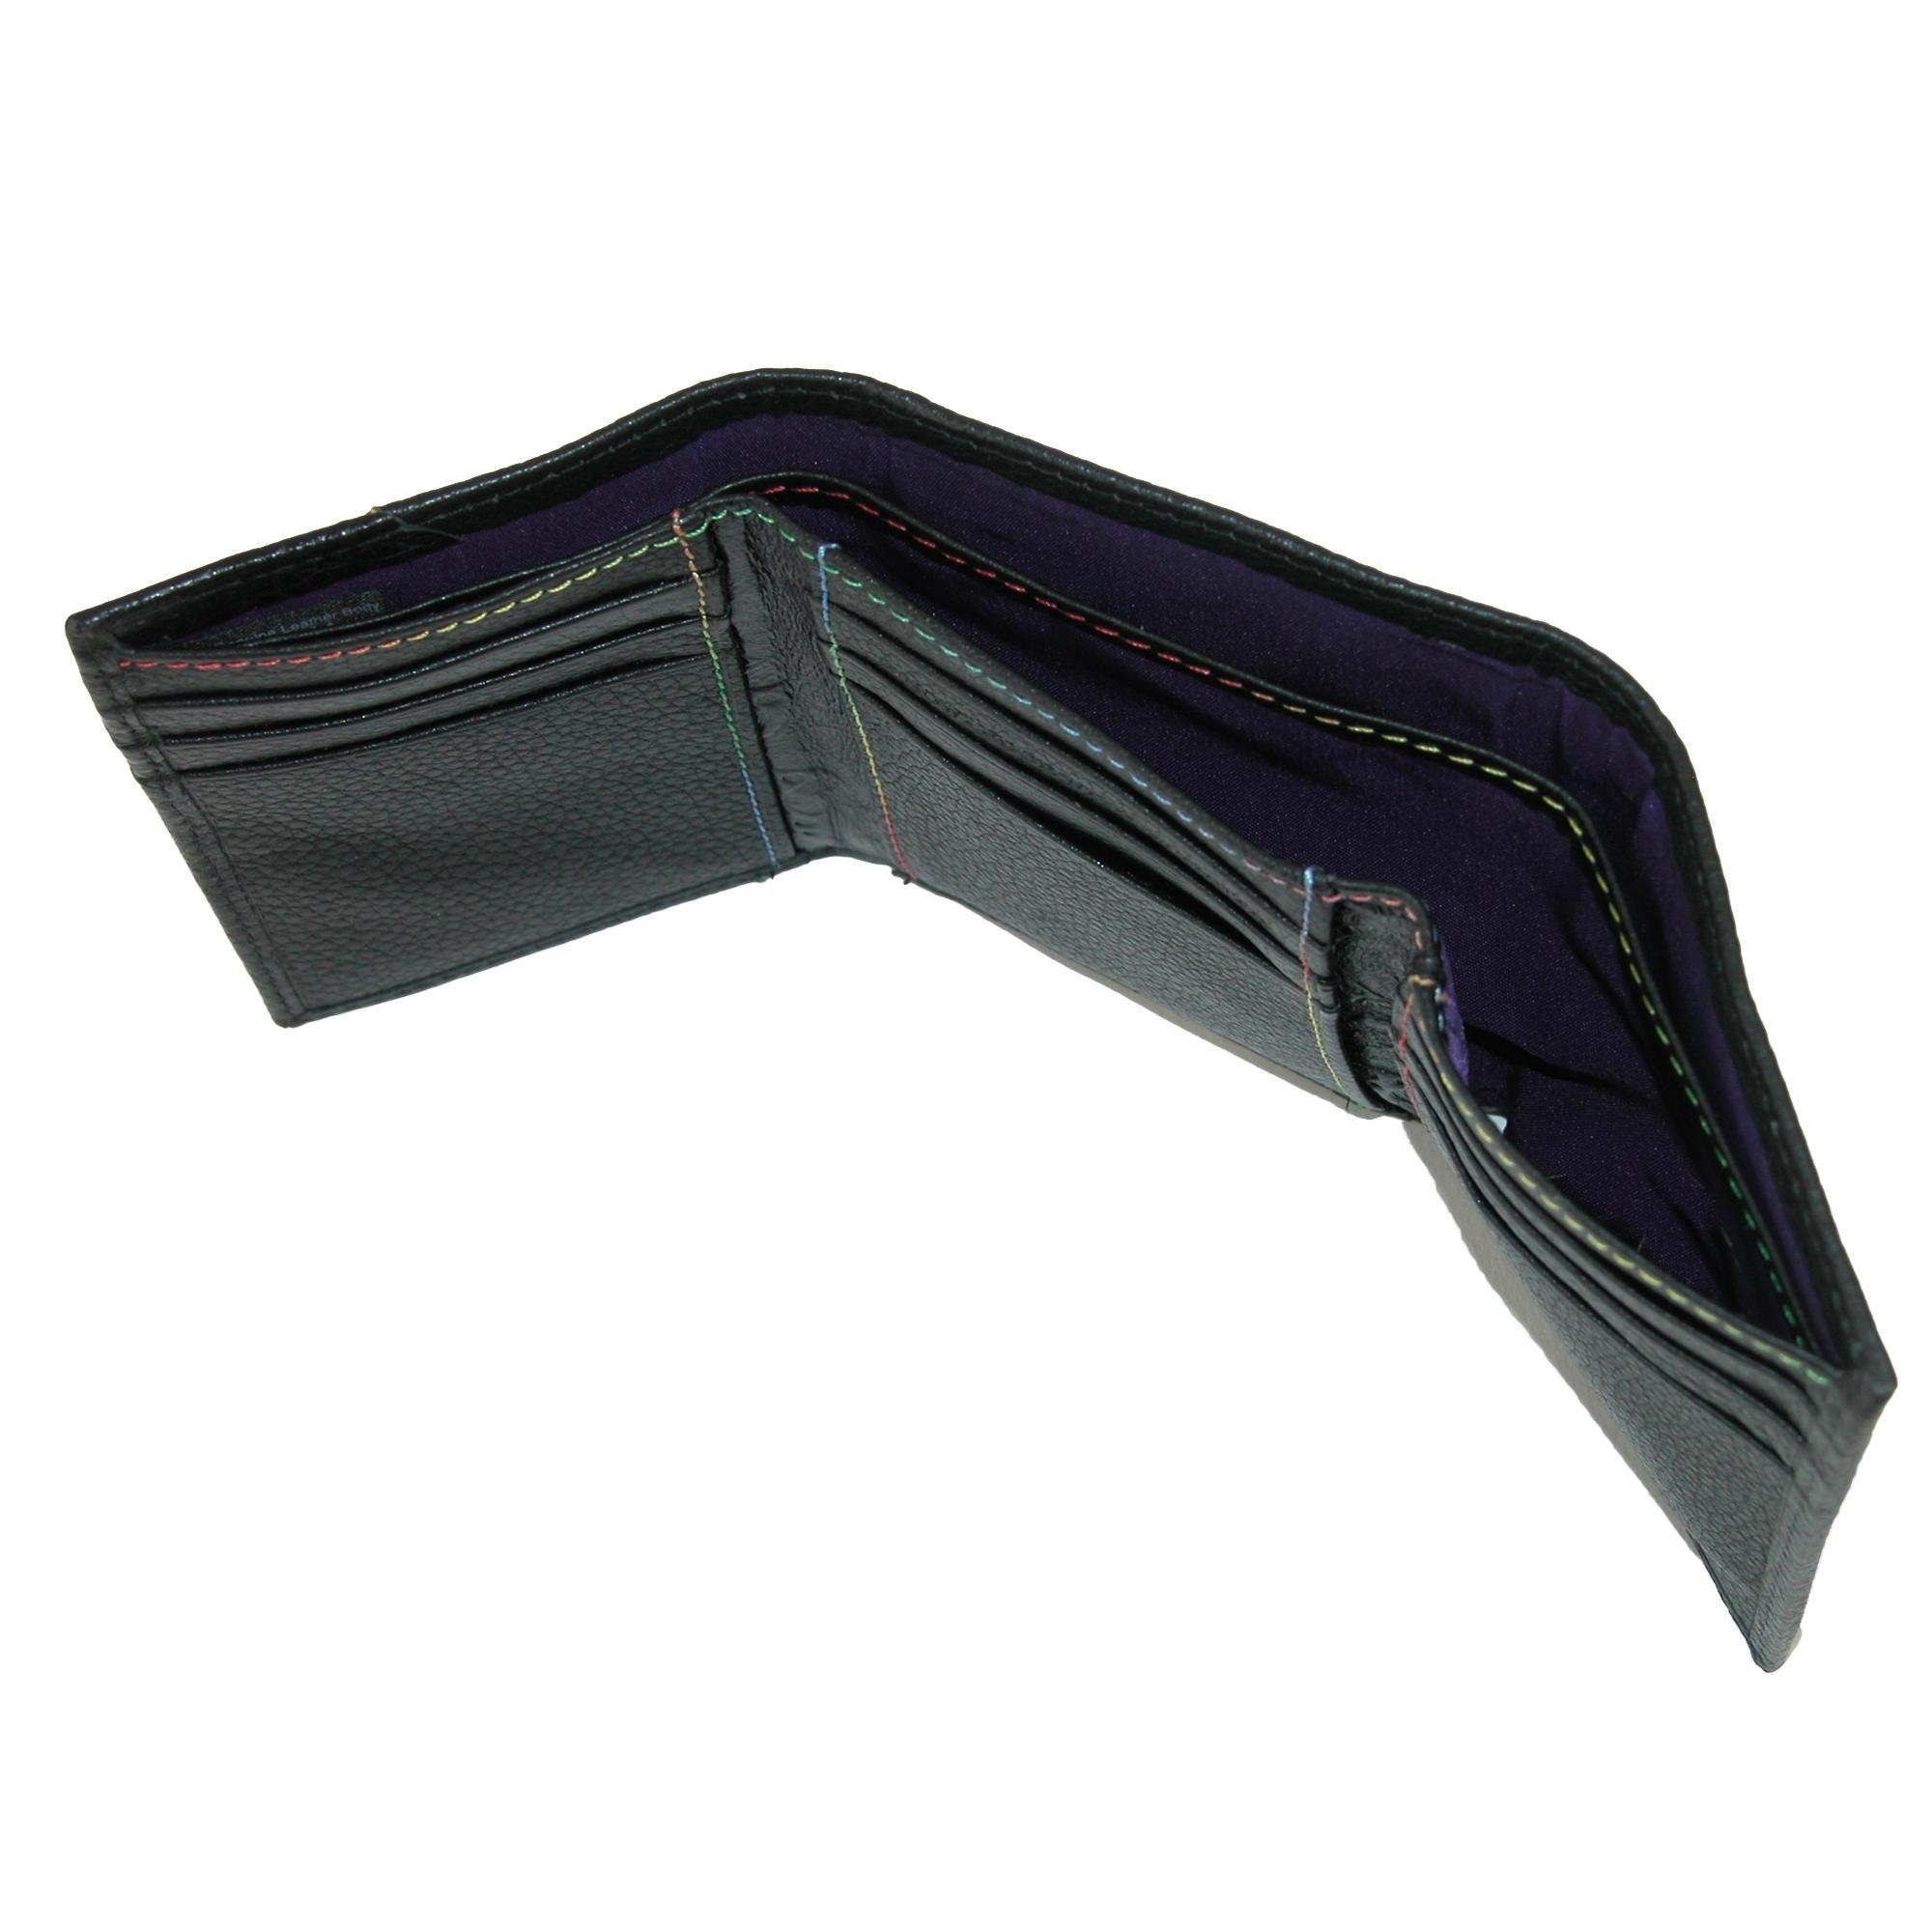 Robert Graham Men's Clarke Trifold Wallet, Black, One Size by Robert Graham (Image #3)